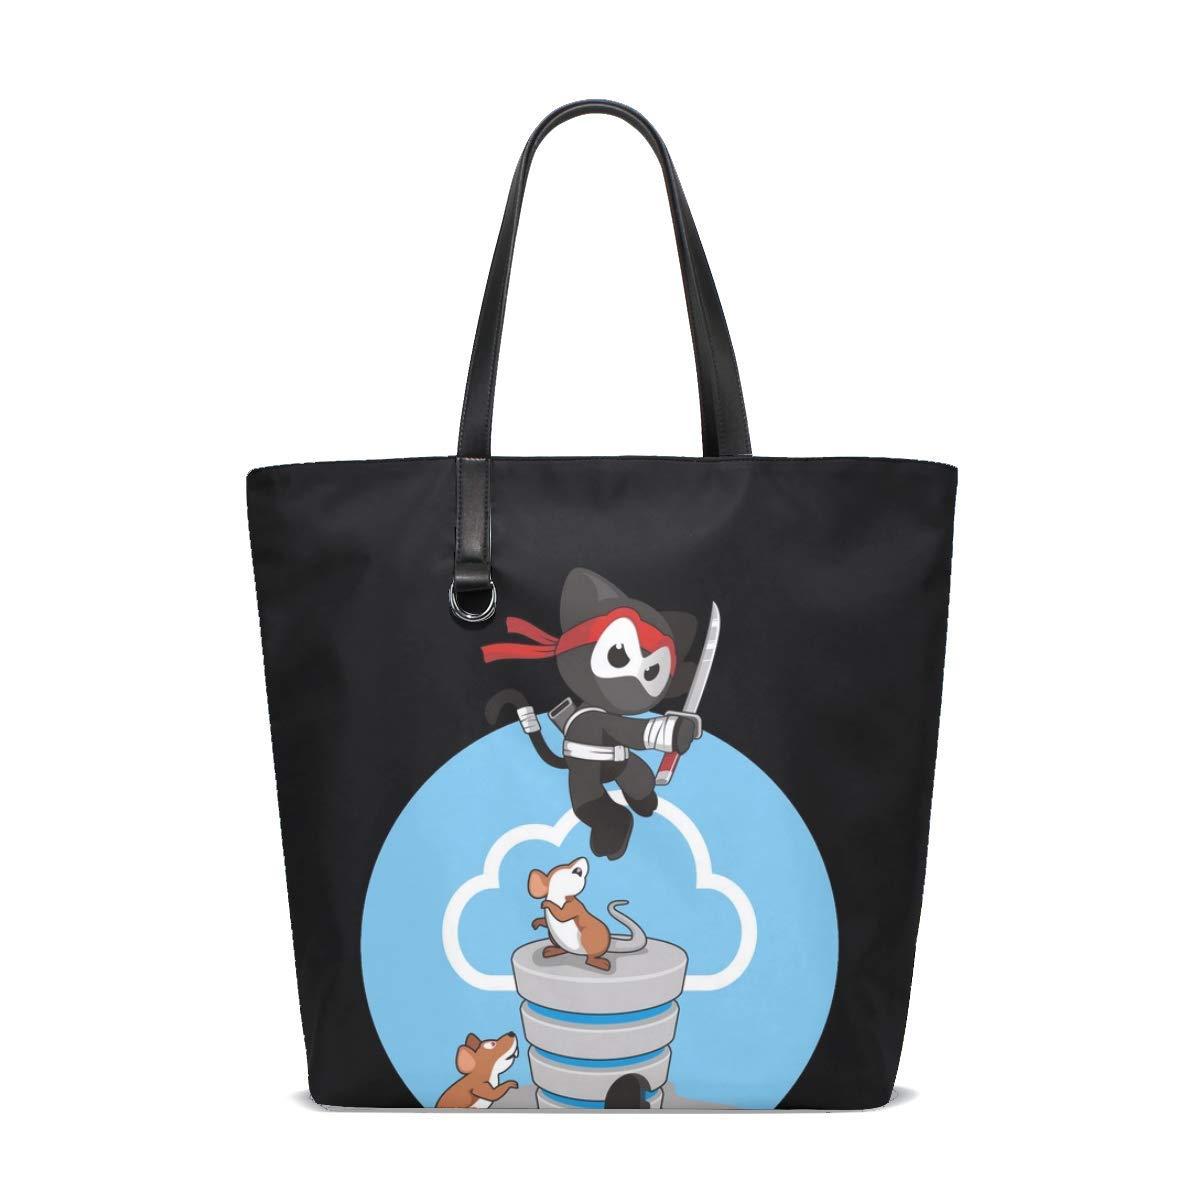 Amazon.com: Ninja Cat Mouse Tote Bag Purse Handbag For Women ...